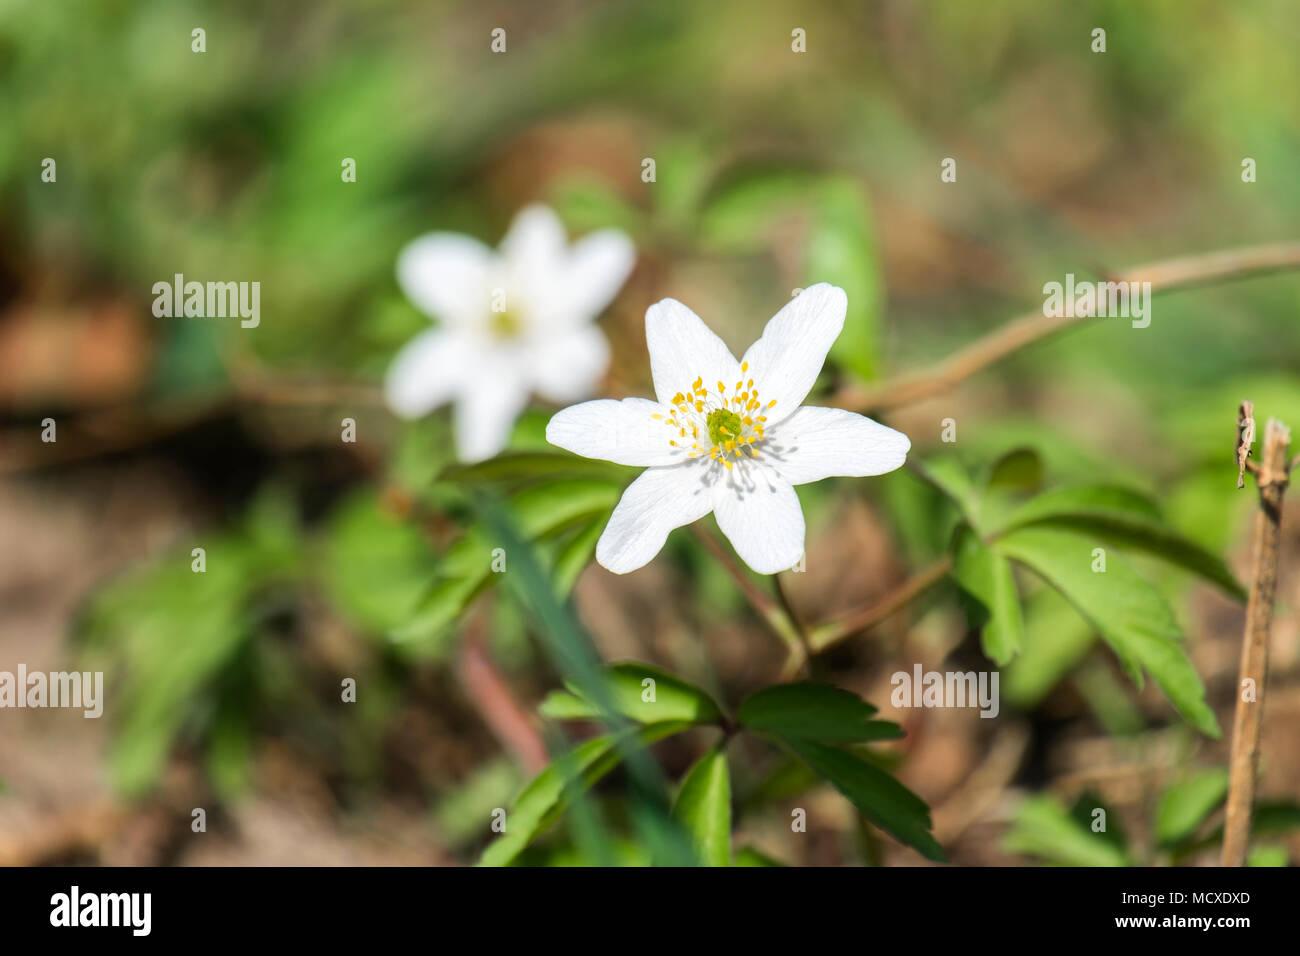 White Early Spring Flower Of Wood Anemone Anemone Nemorosa Stock